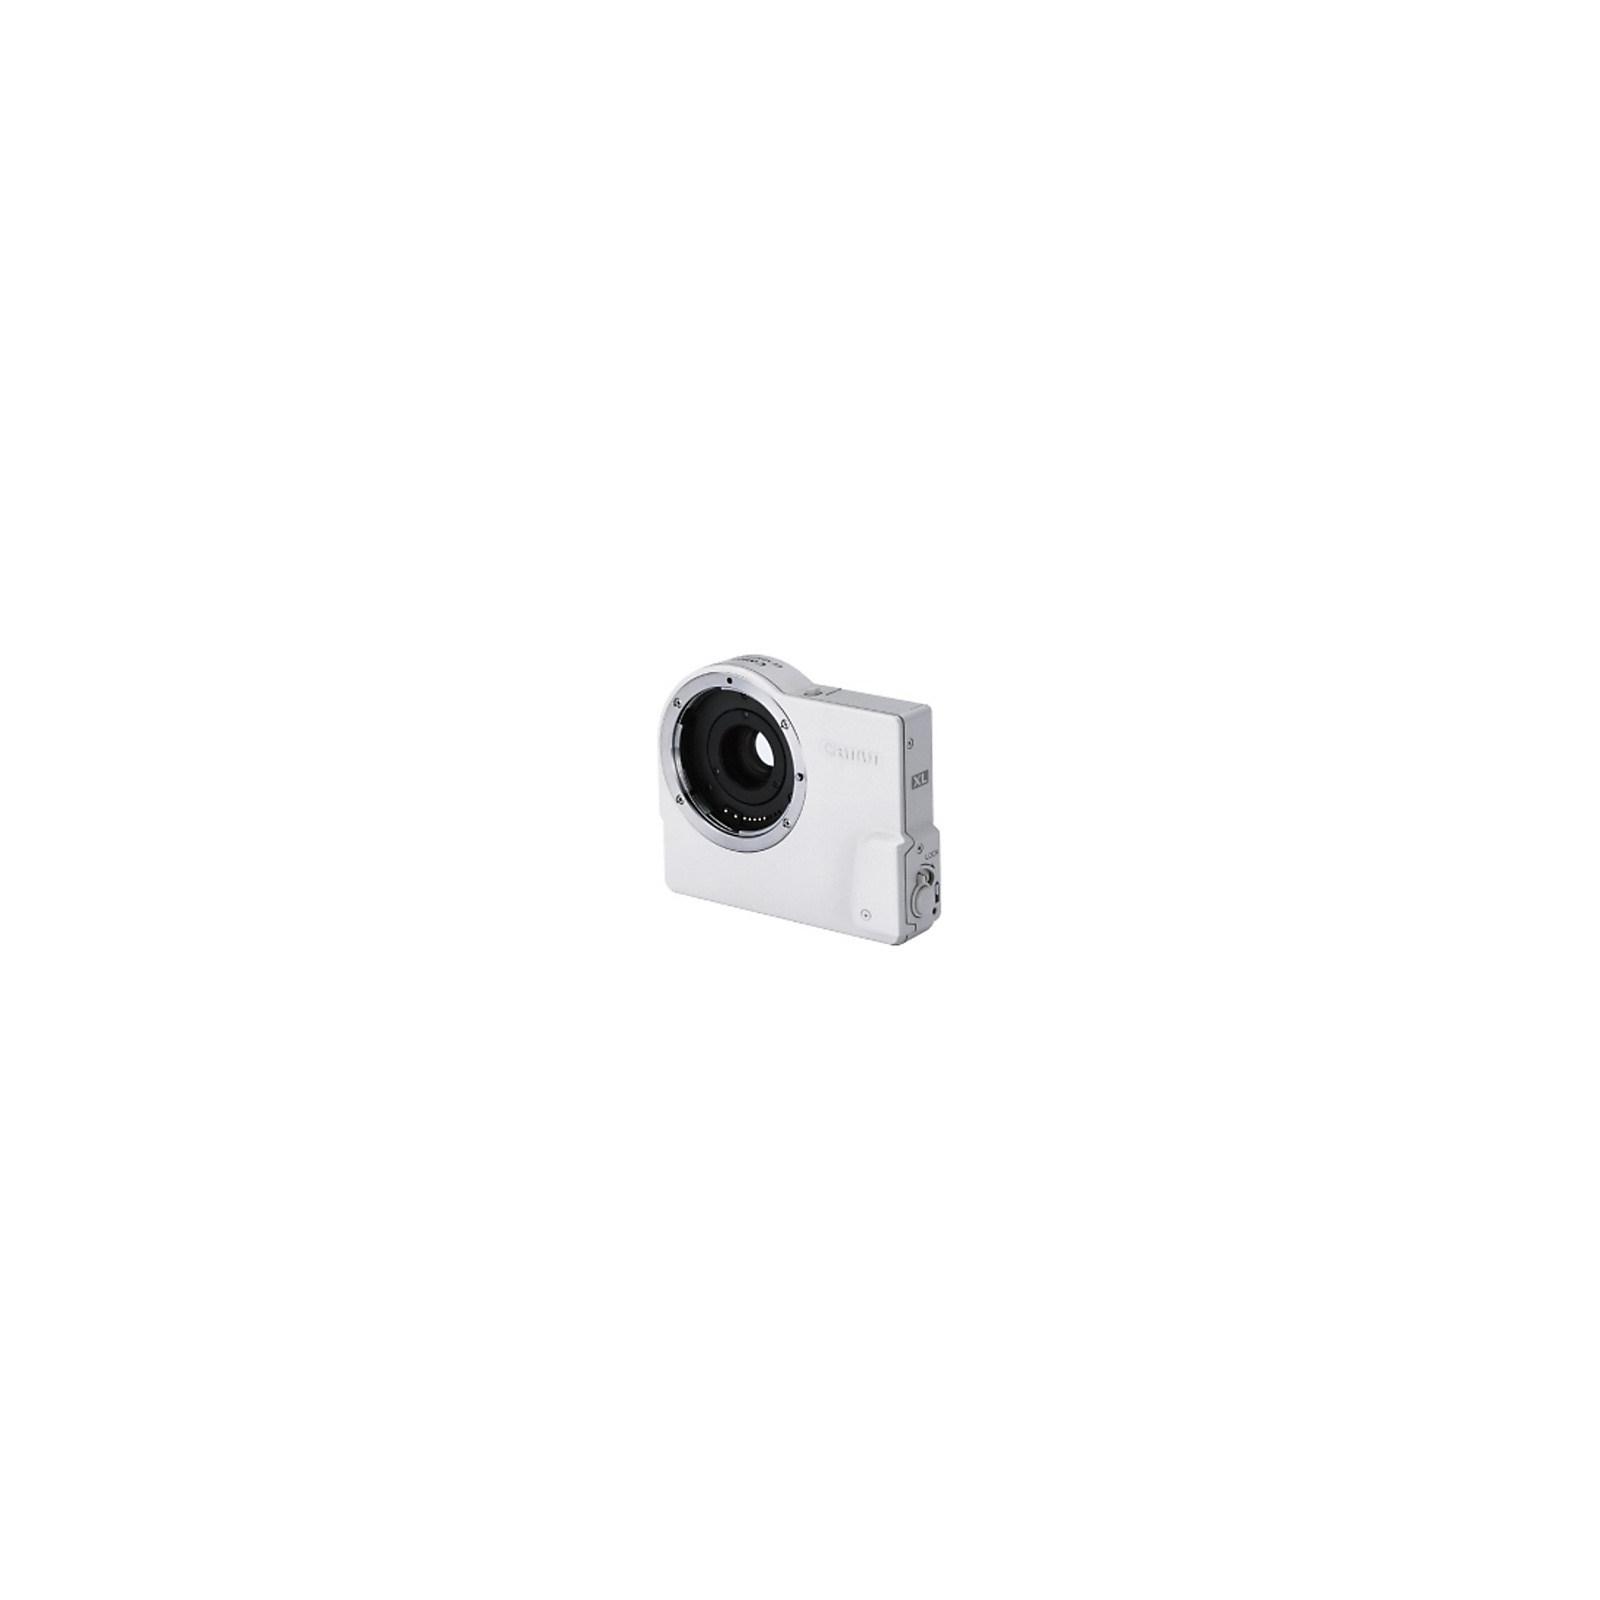 Фото-адаптер EOS EF XL1 Canon (3162A003)